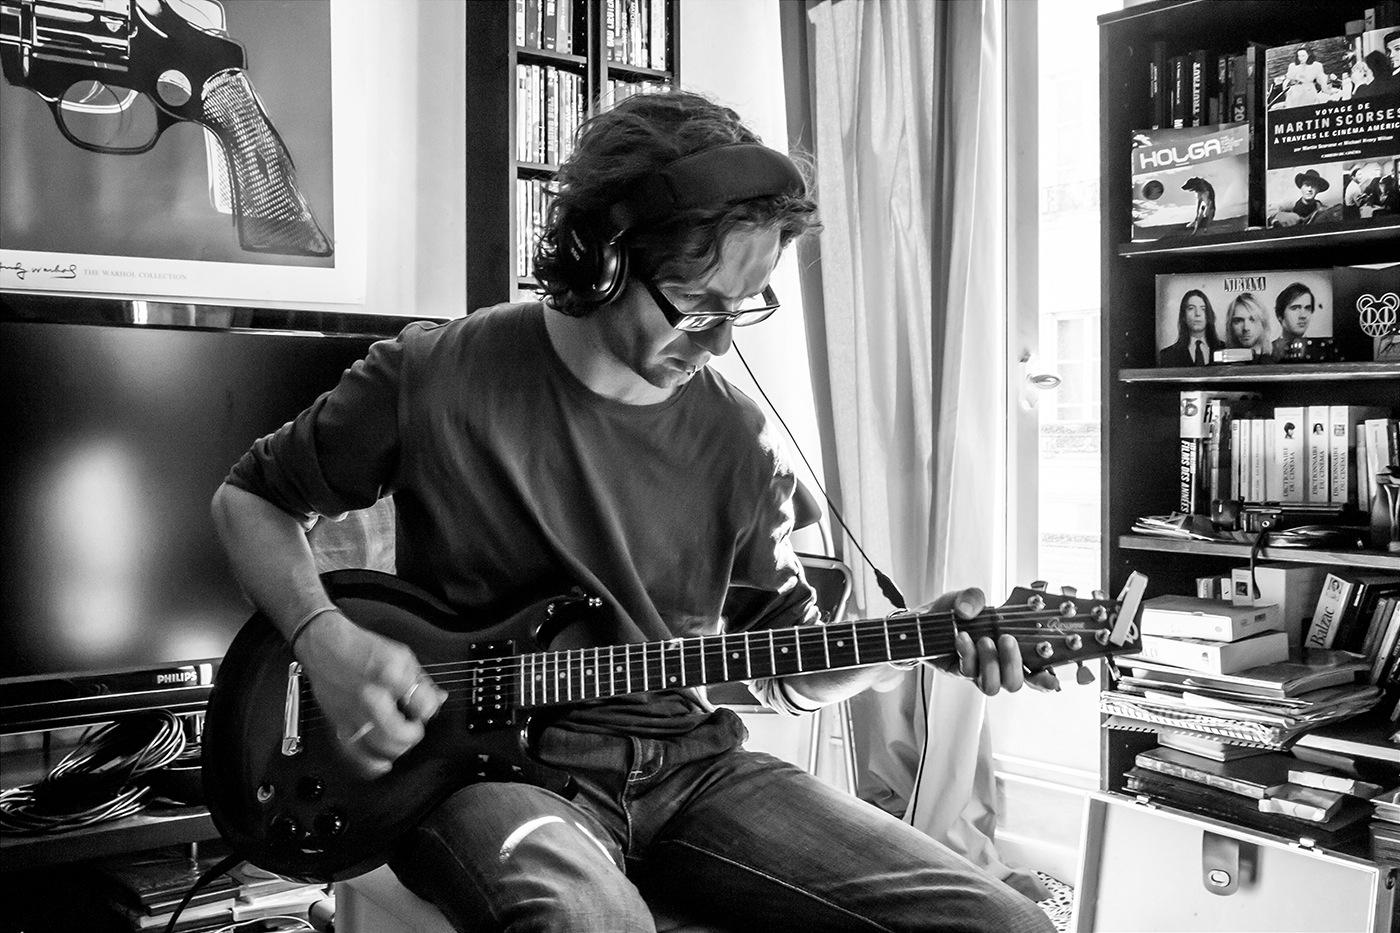 Nico guitare (N&B)